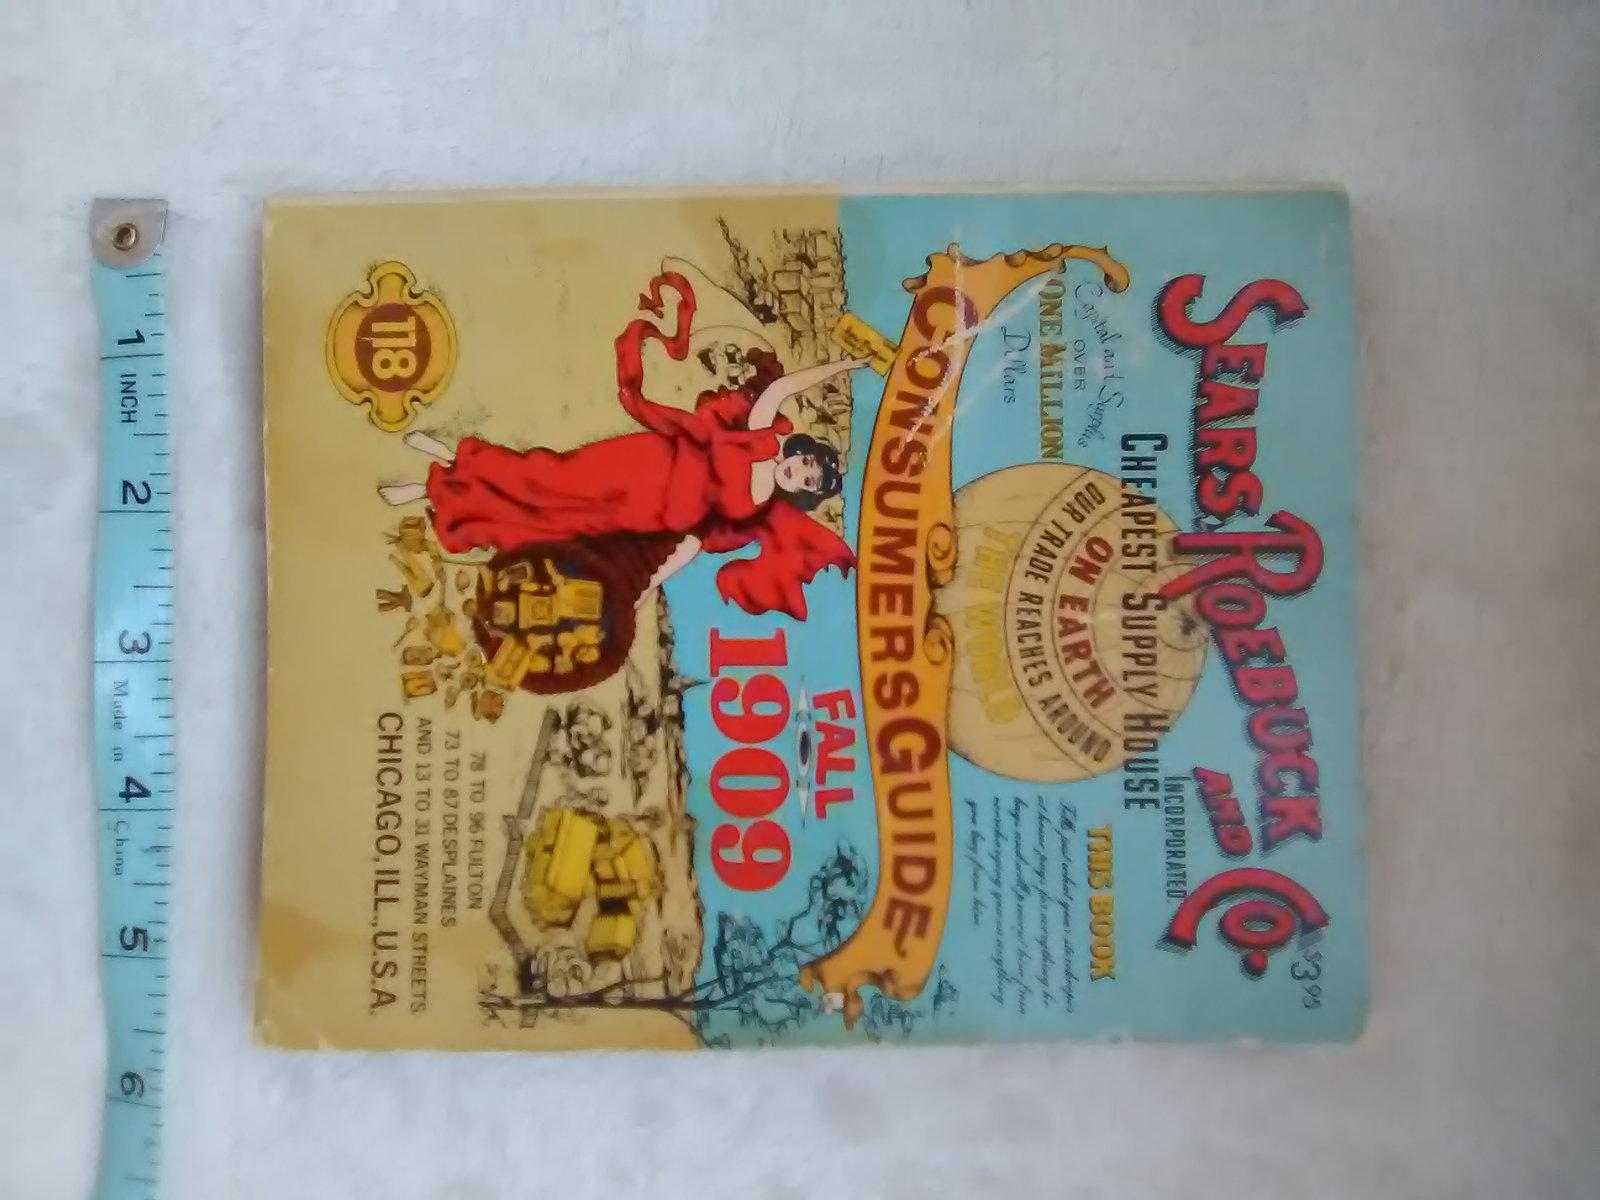 Sears Roebuck and Co. 1909 Catalog, Consumers Guide, Fall 1909 Ventura 887